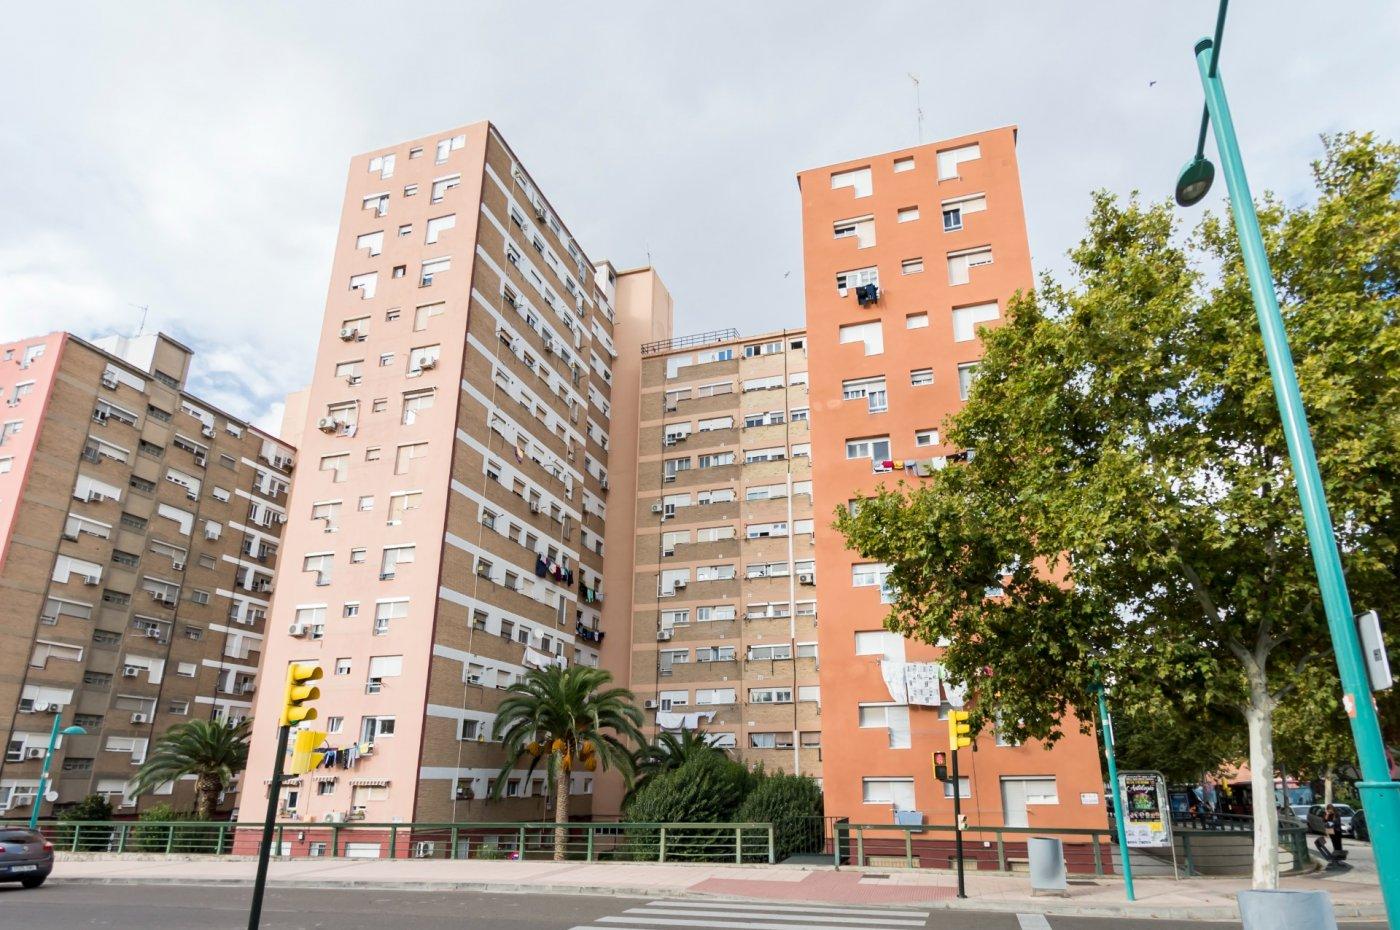 Piso · Zaragoza · Barrio Jesus 550€ MES€